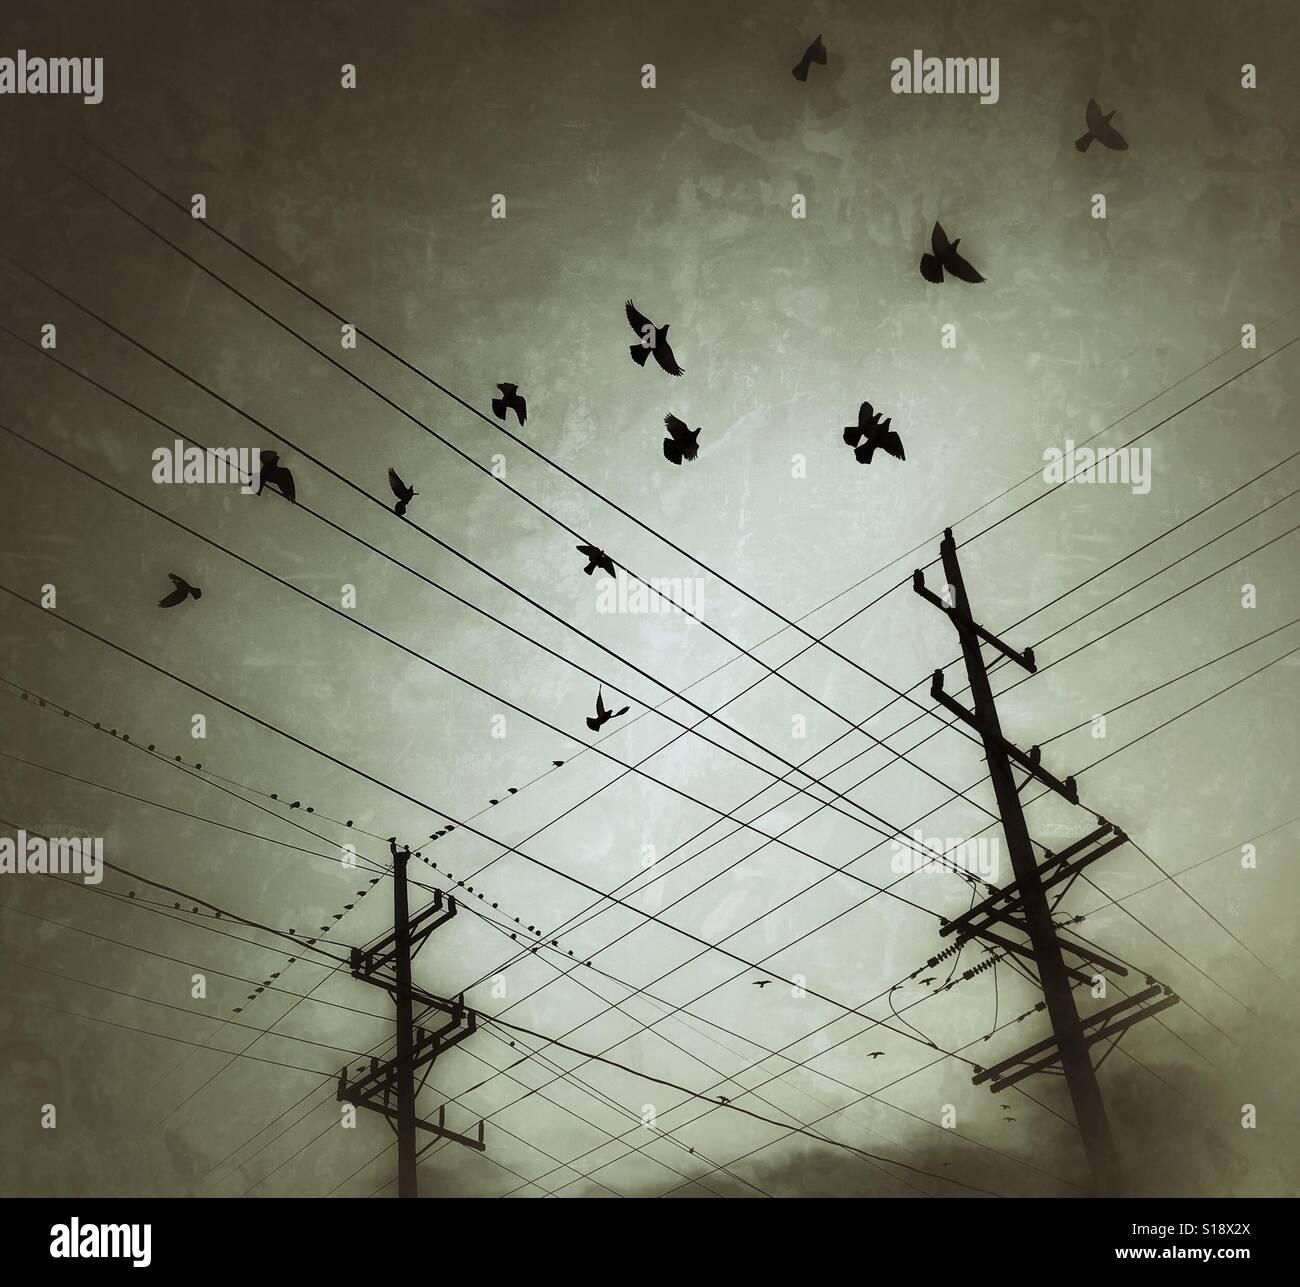 Birds and telephone lines Stock Photo: 310597362 - Alamy